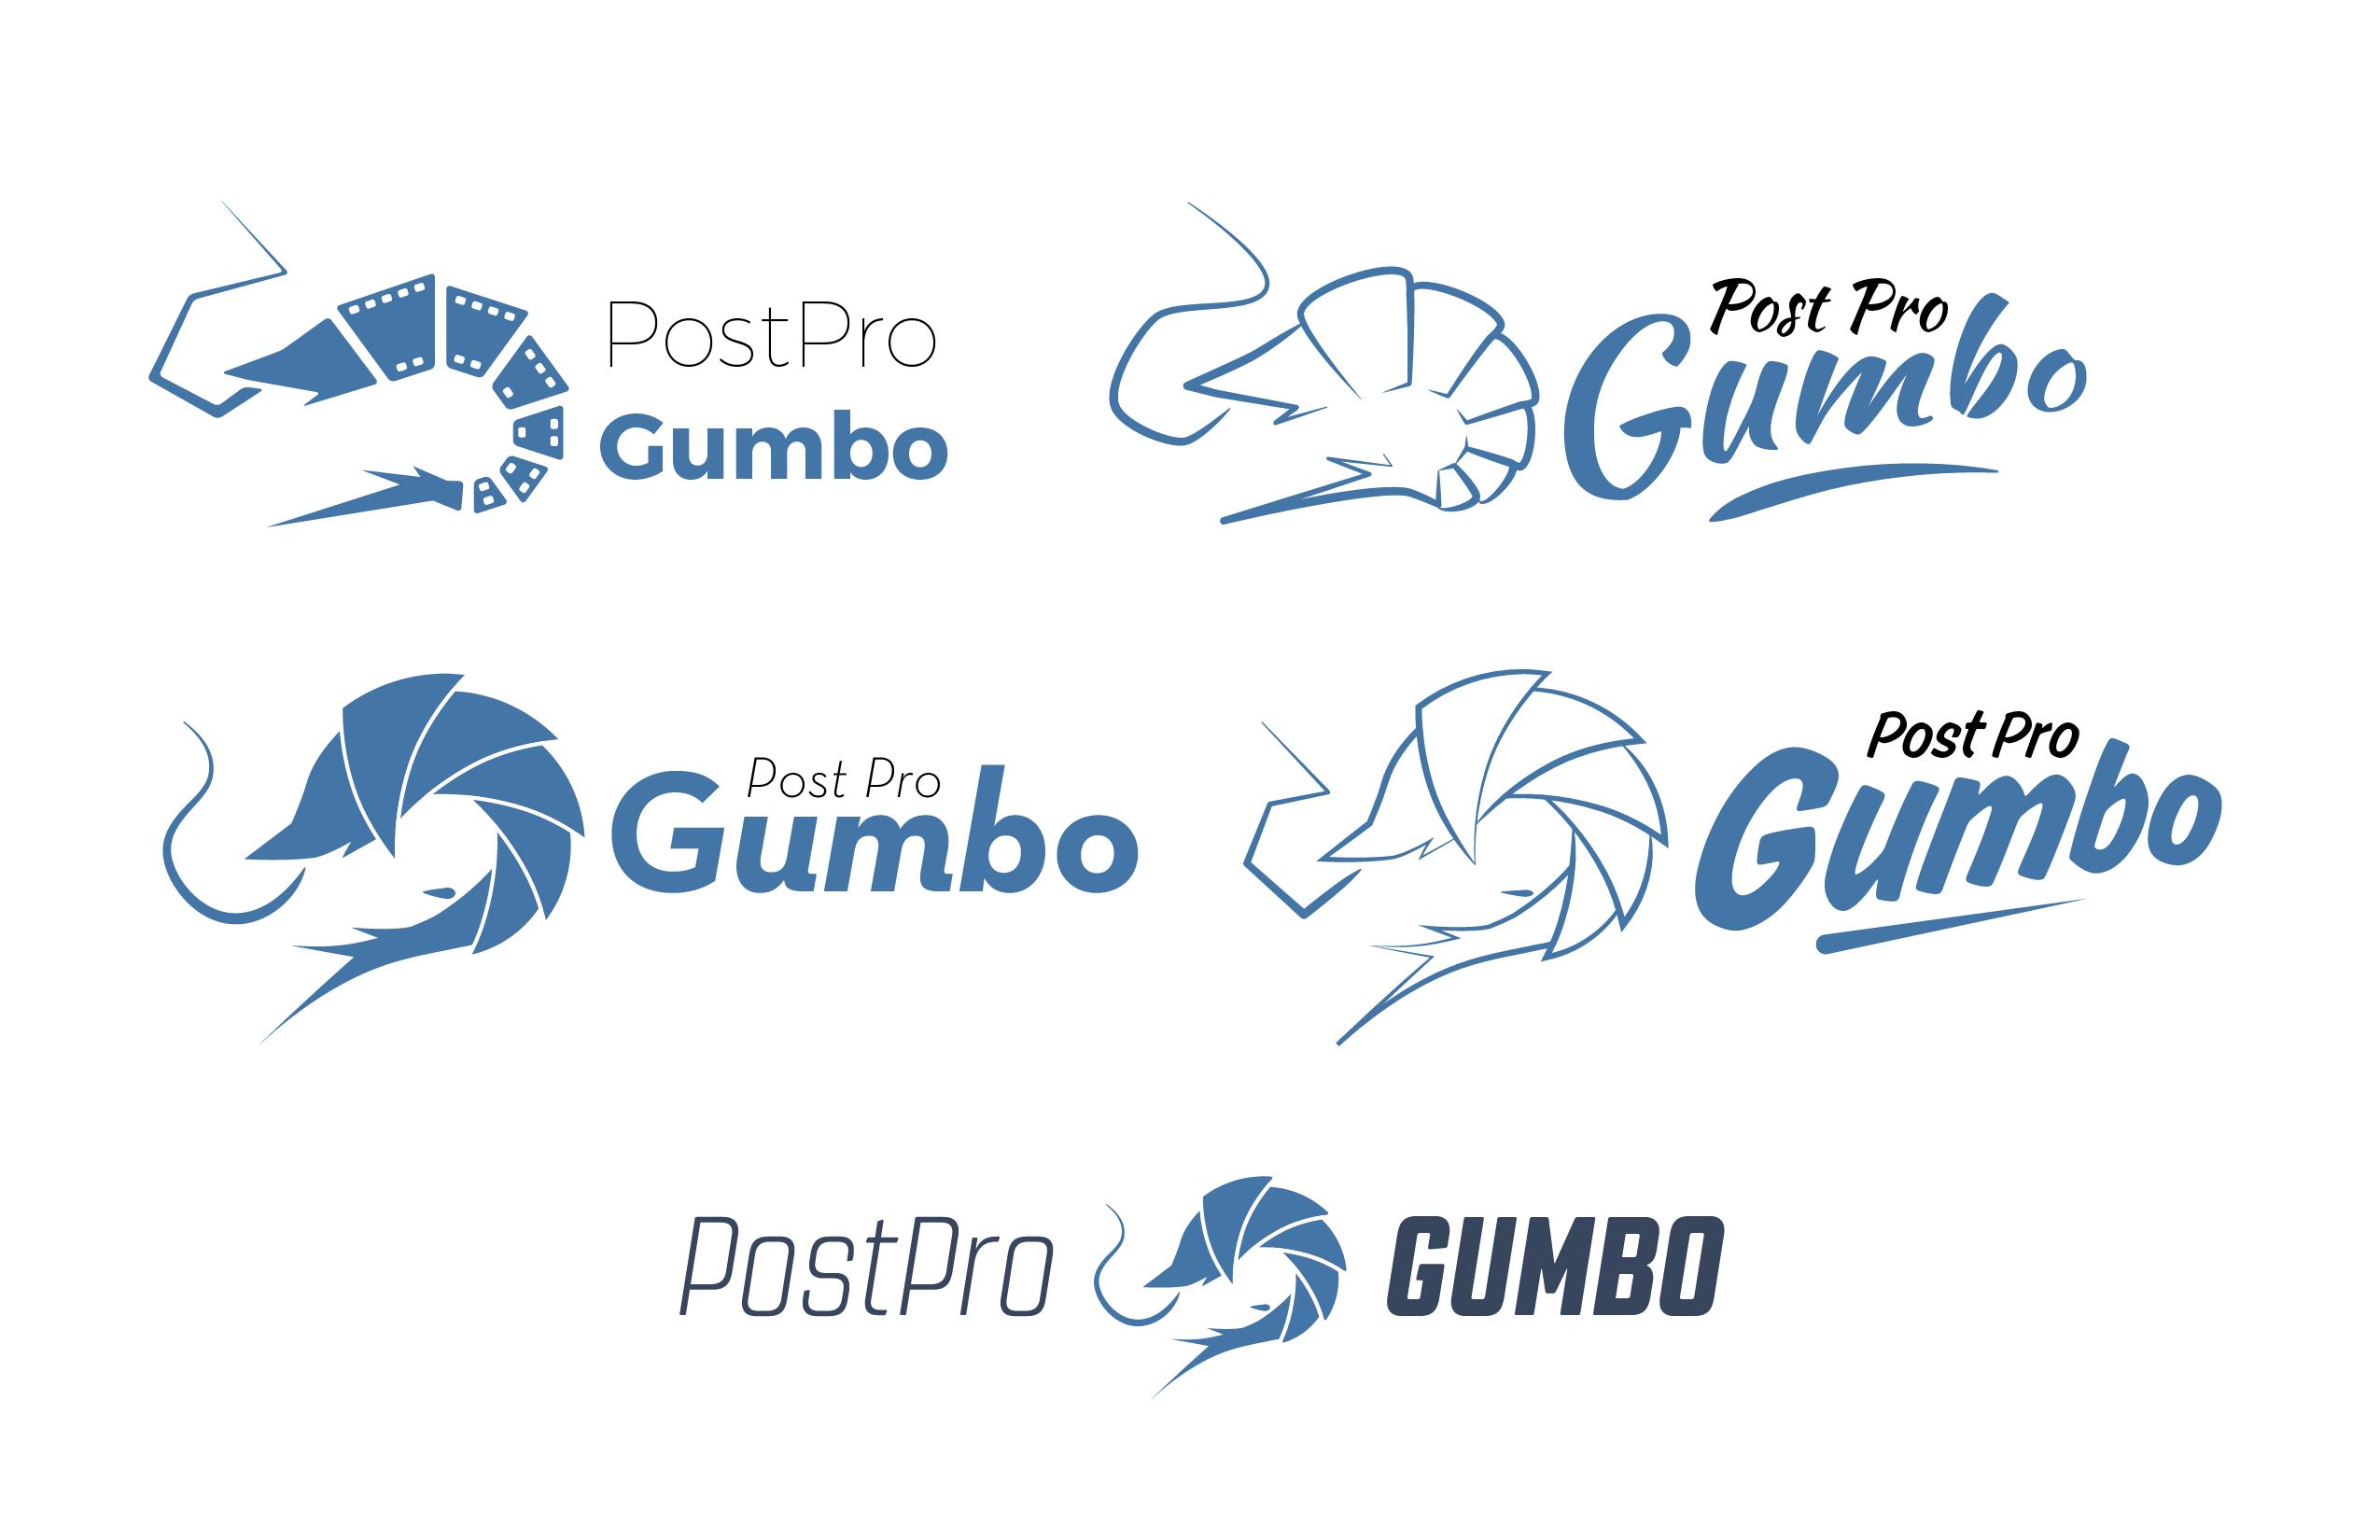 Post Pro Gumbo Logo design